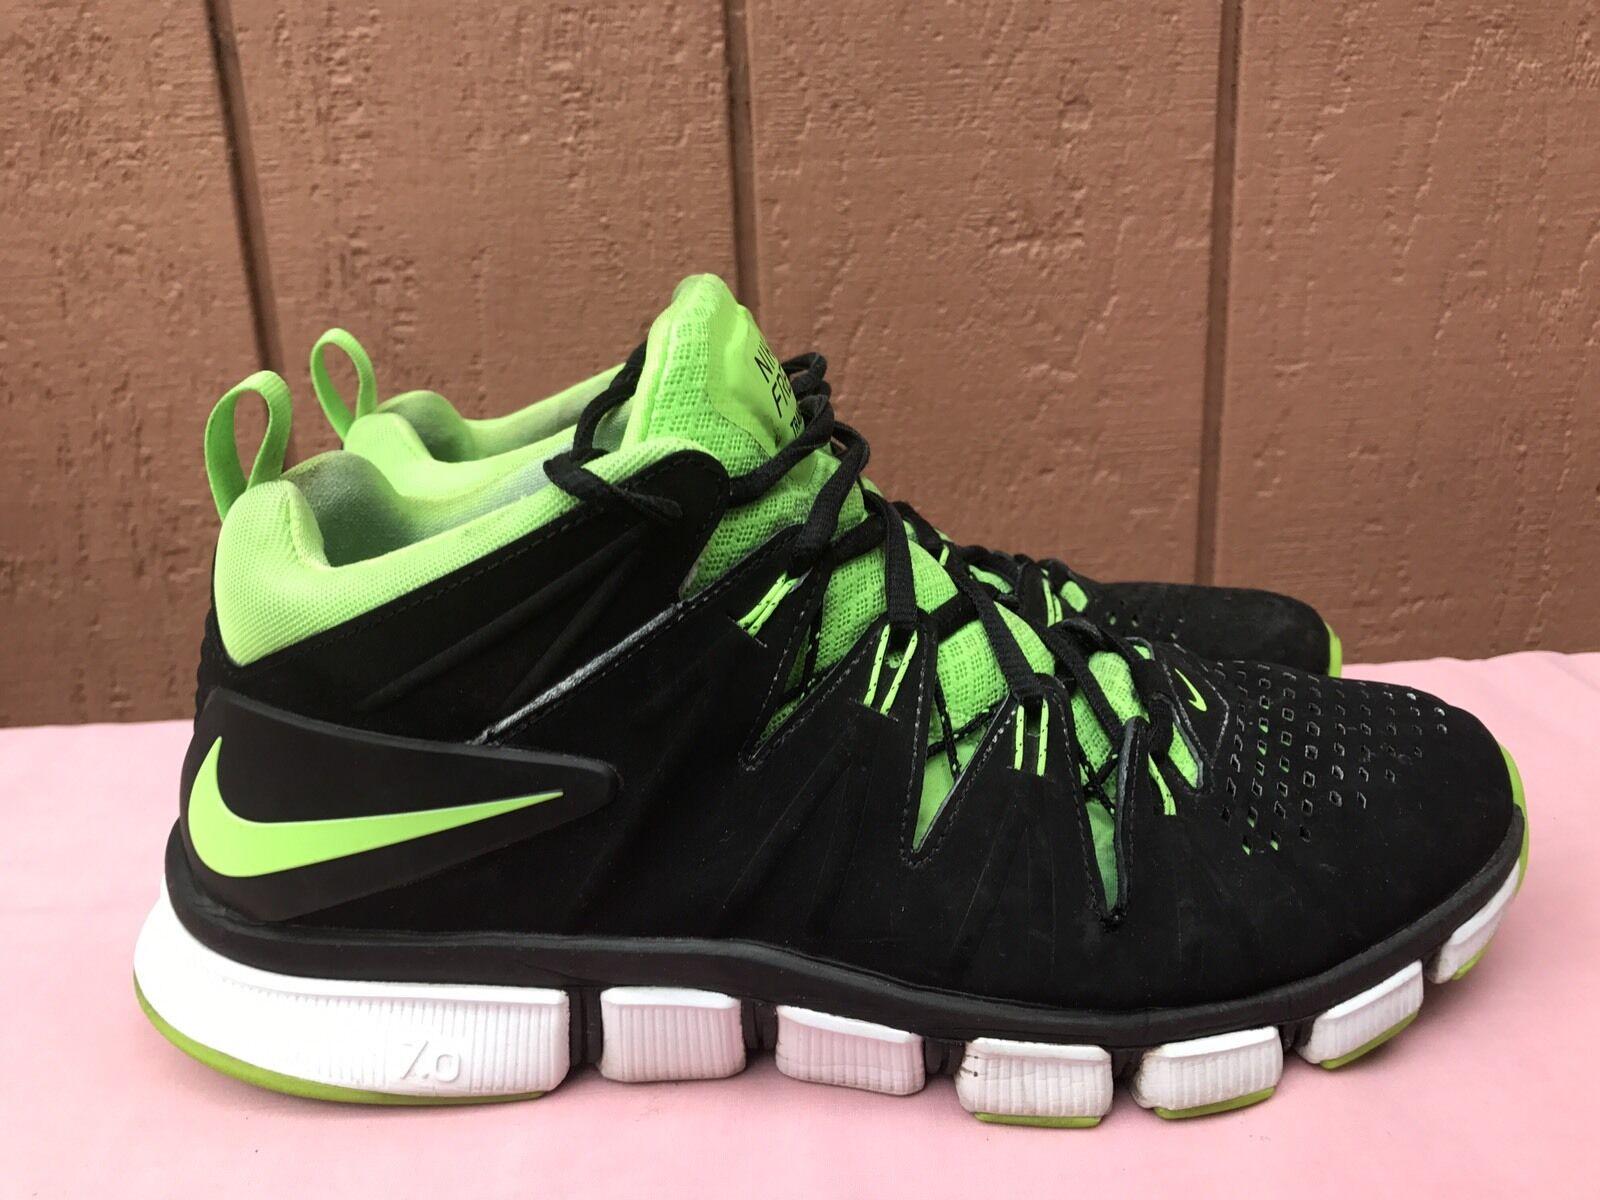 online retailer e8c2f 75554 EUC RARE Mens Nike Free Free Free Trainer 7.0 Training shoes ...